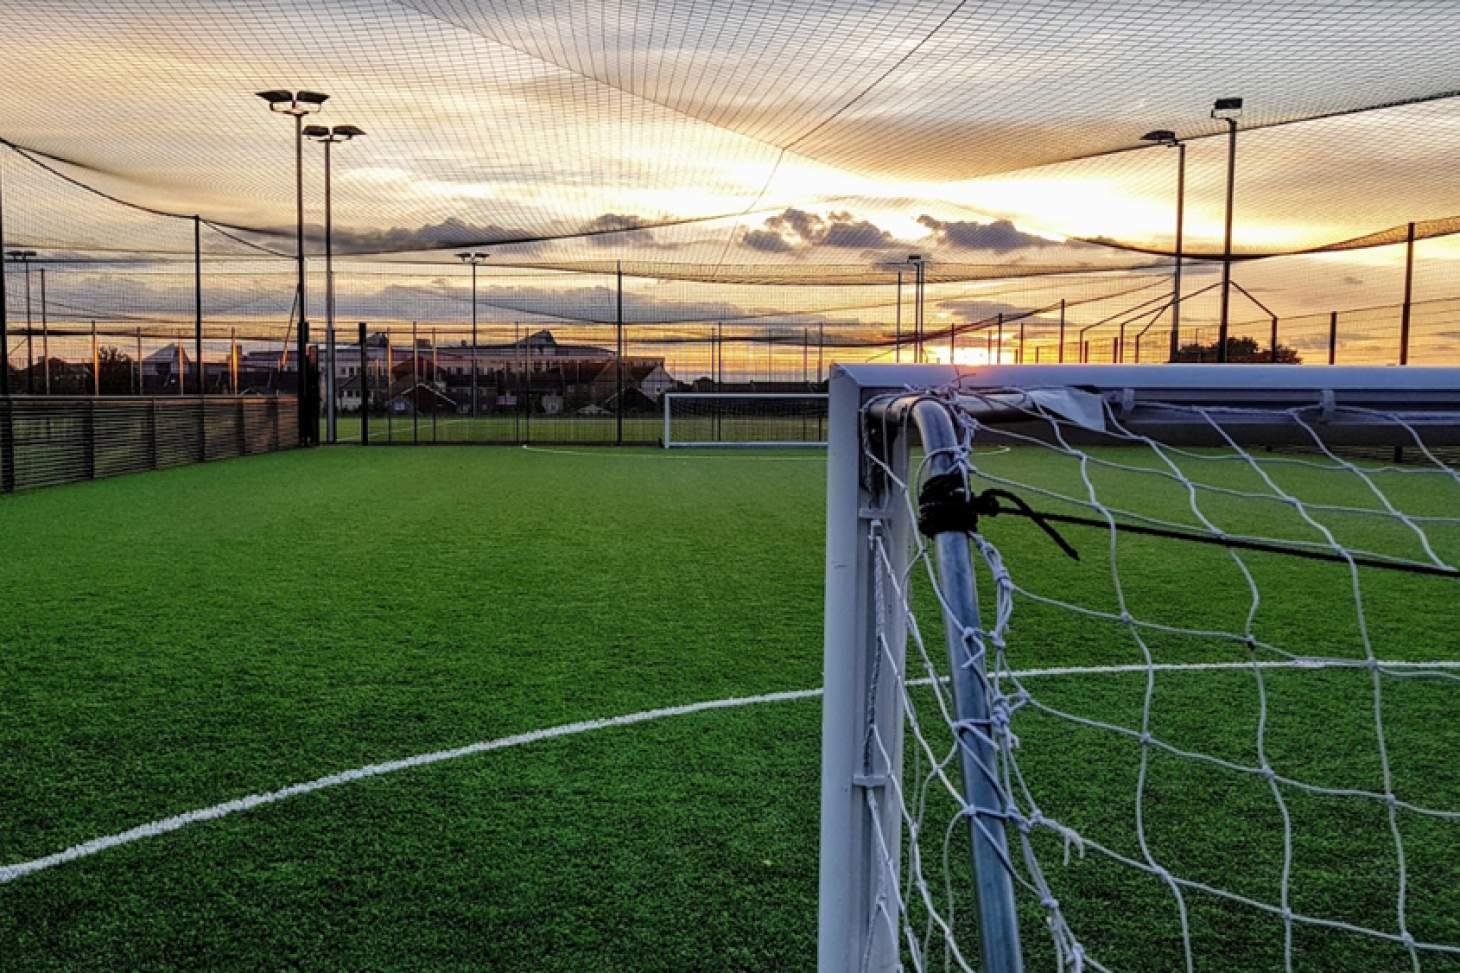 PlayFootball Bristol Horfield 5 a side | 3G Astroturf football pitch